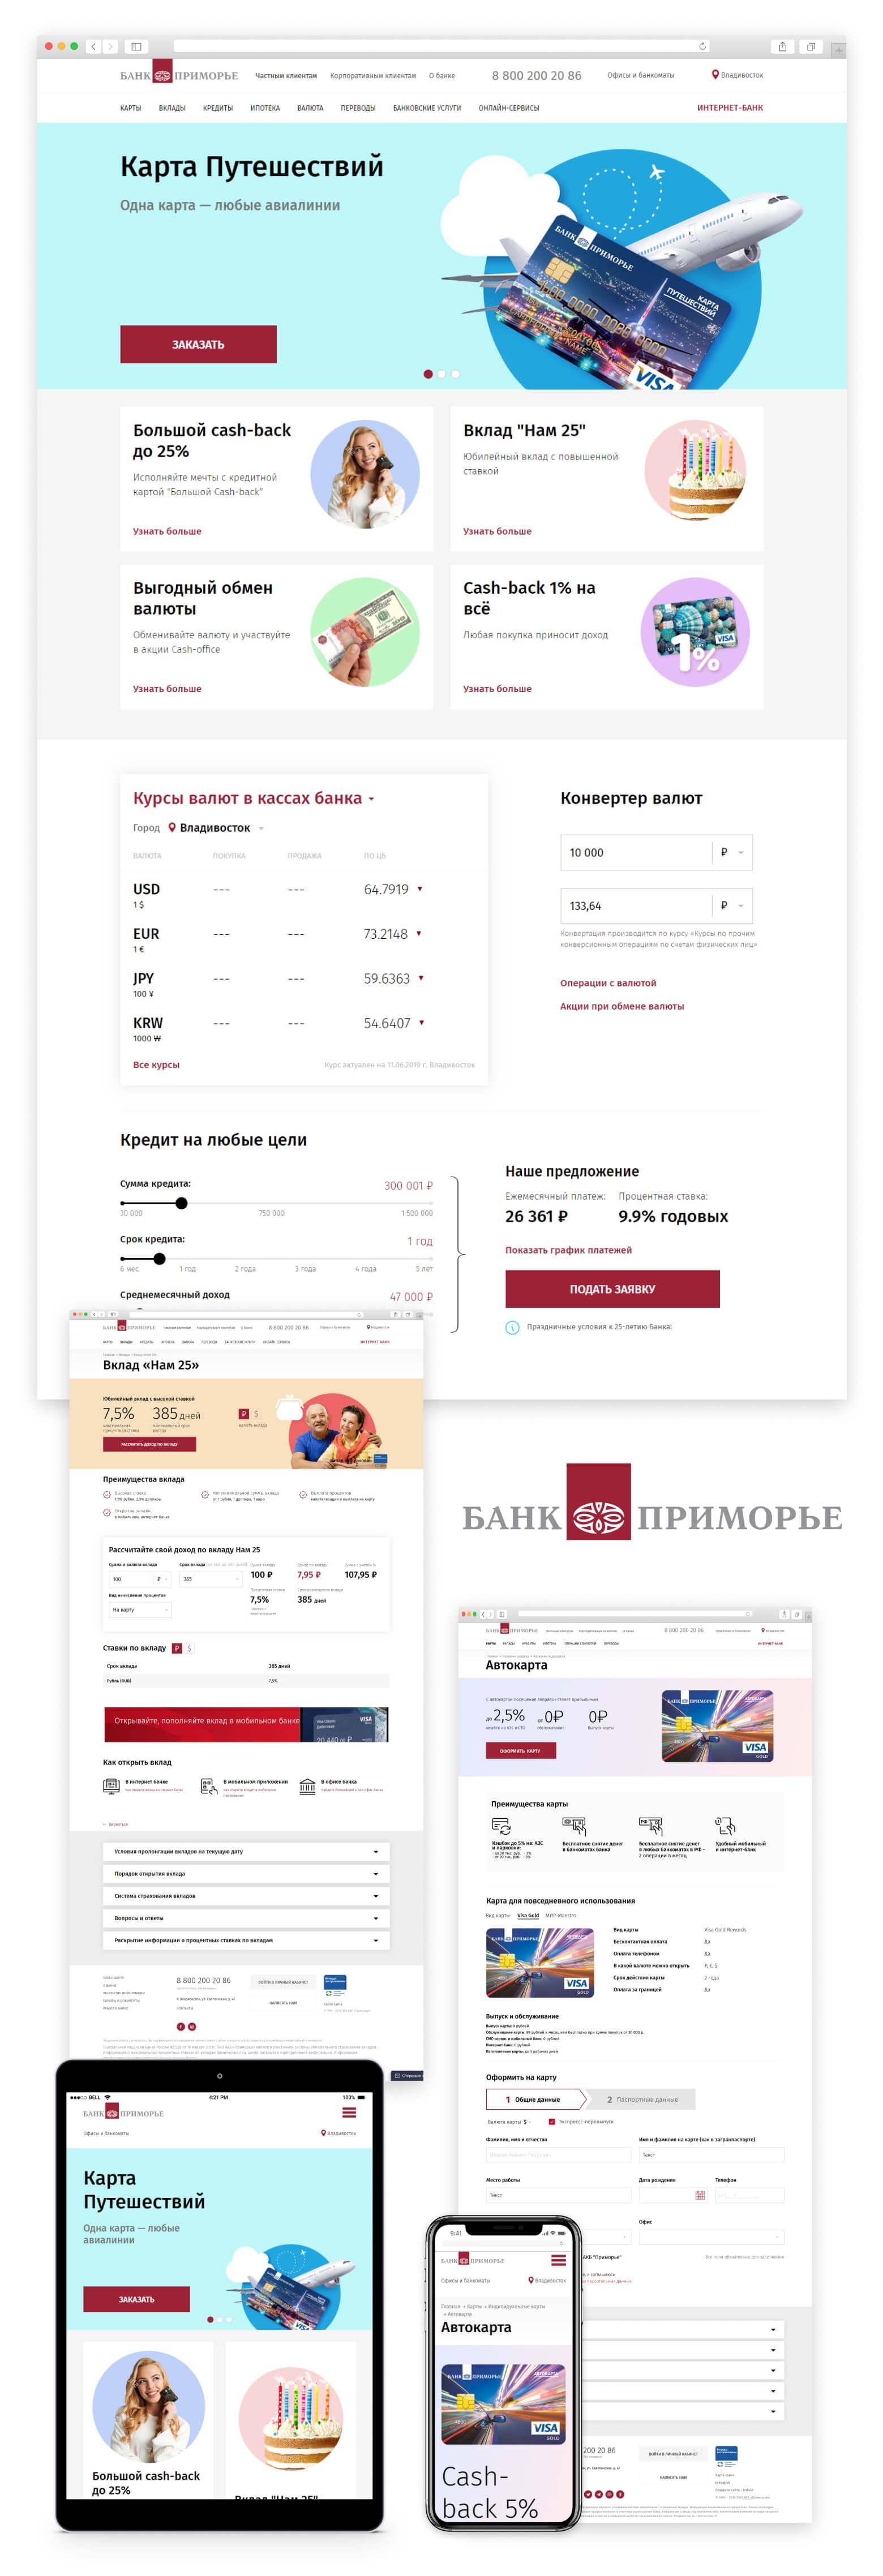 Россельхозбанк расчет кредита онлайн калькулятор 2020